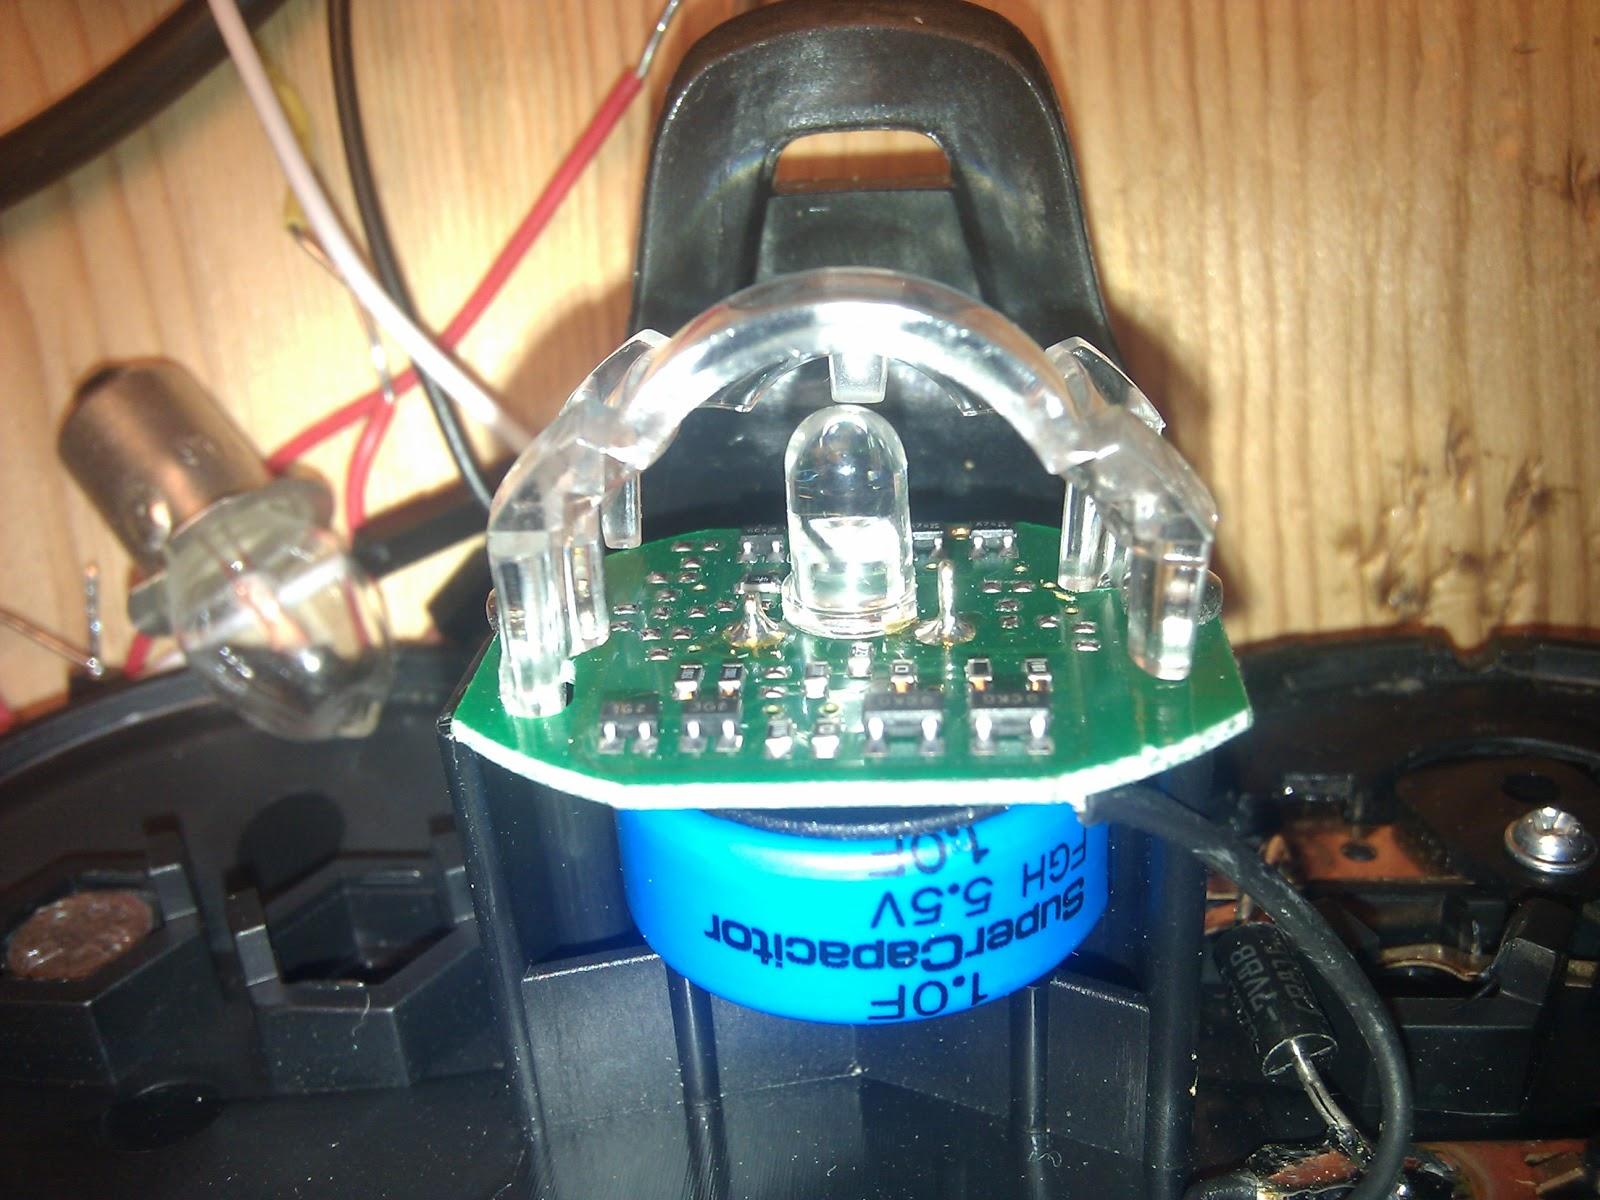 Bicycle Lighting Charging Supercapacitors Ltc4425 Linear Supercap Charger Electronc Circuit Diagram Bm Taillight Guts